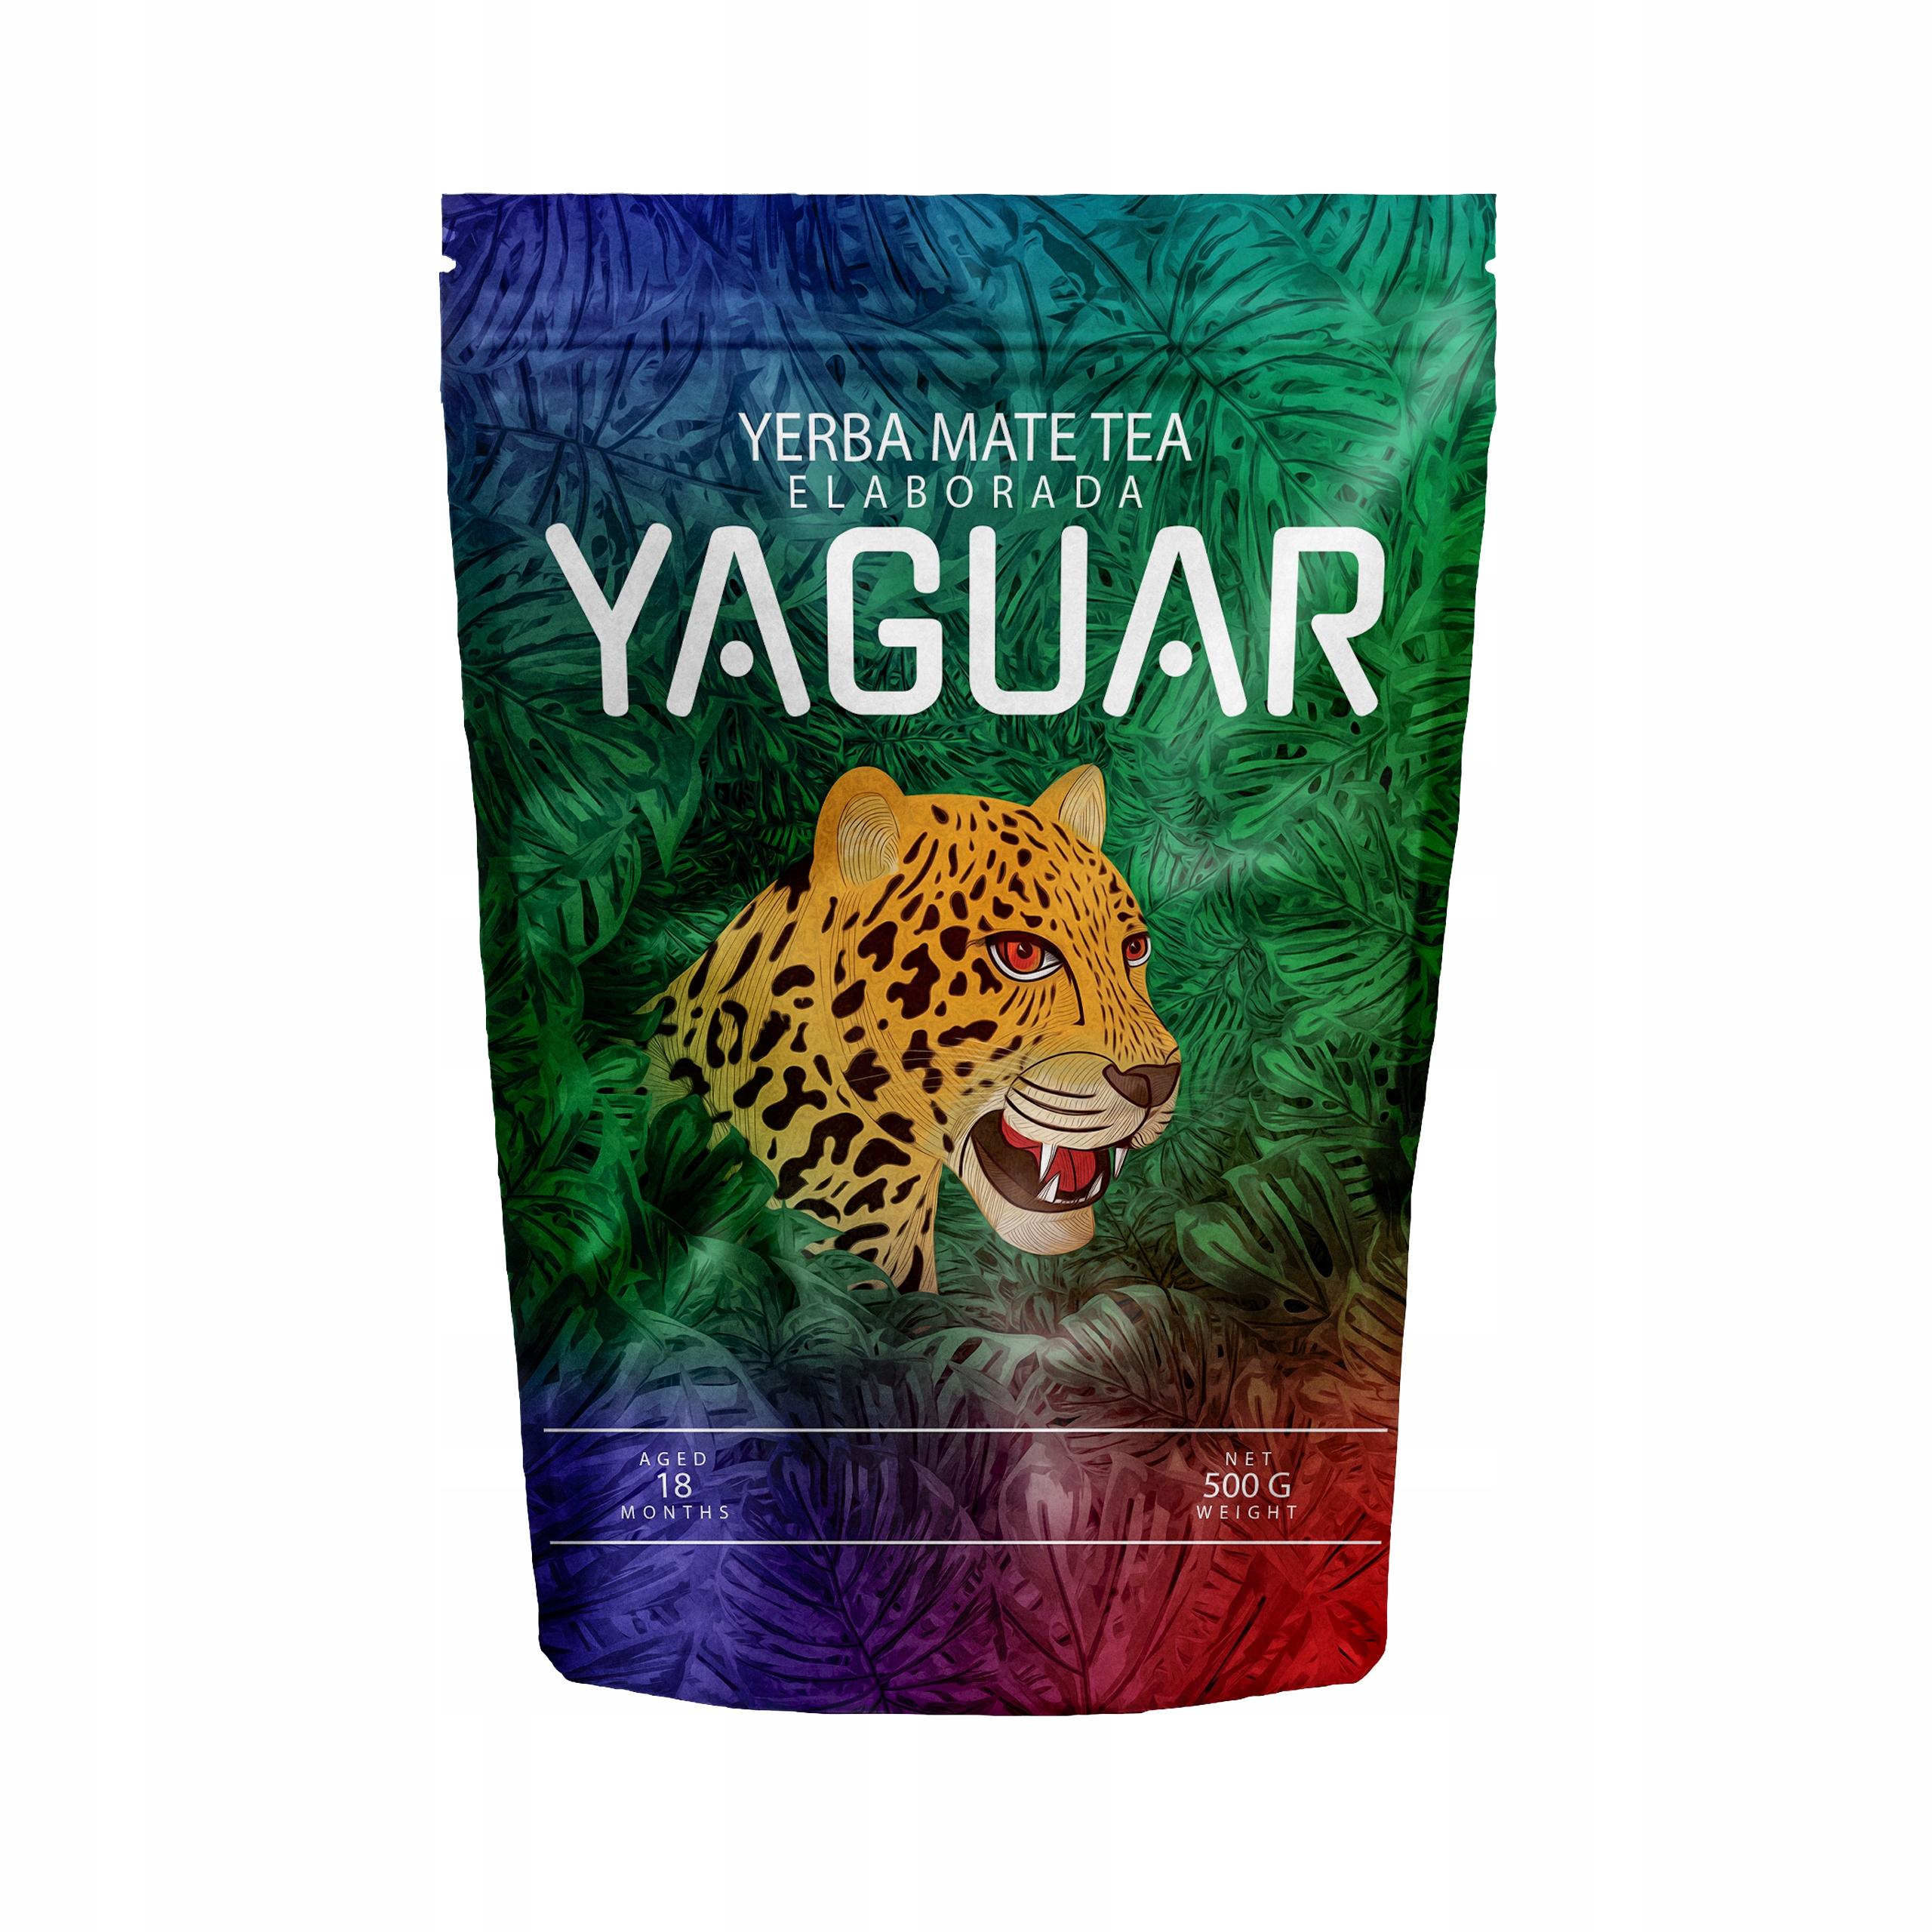 Yerba Mate Yaguar Elaborada Ноль ,5 кг 500 г НОВИНКА